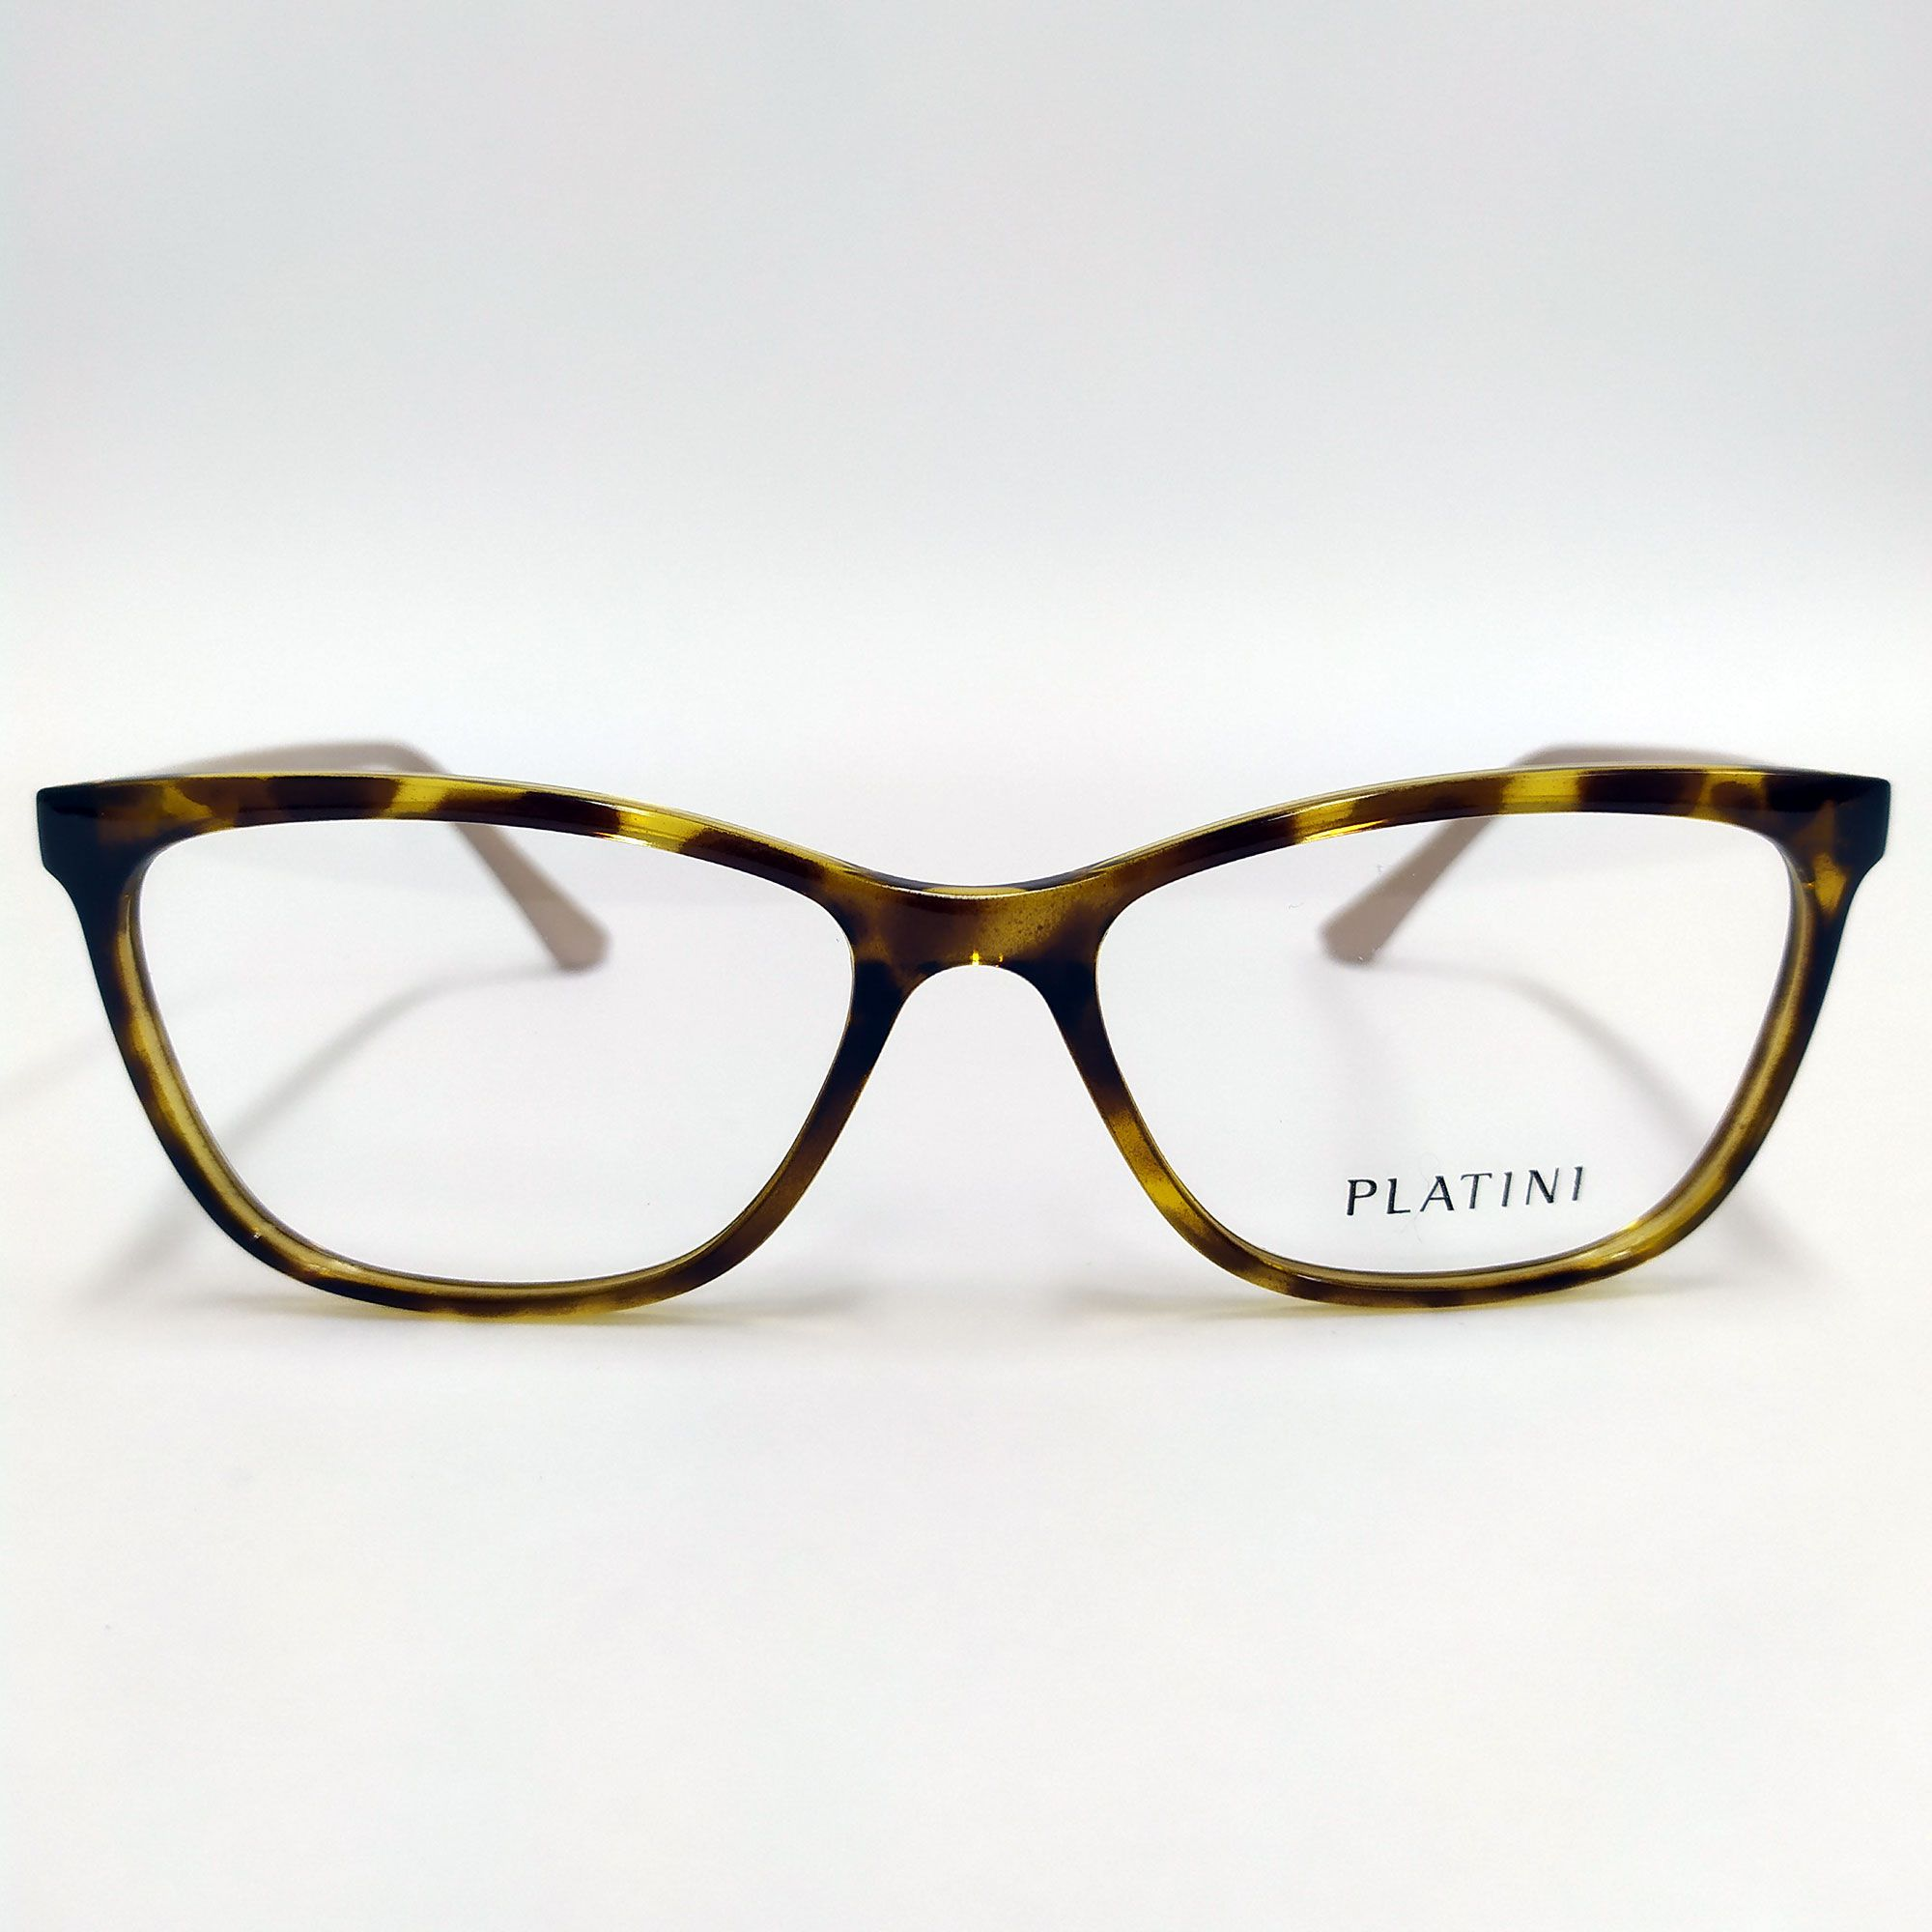 Óculos de Grau Platini Tartaruga com Haste Nude P9 3153B G547